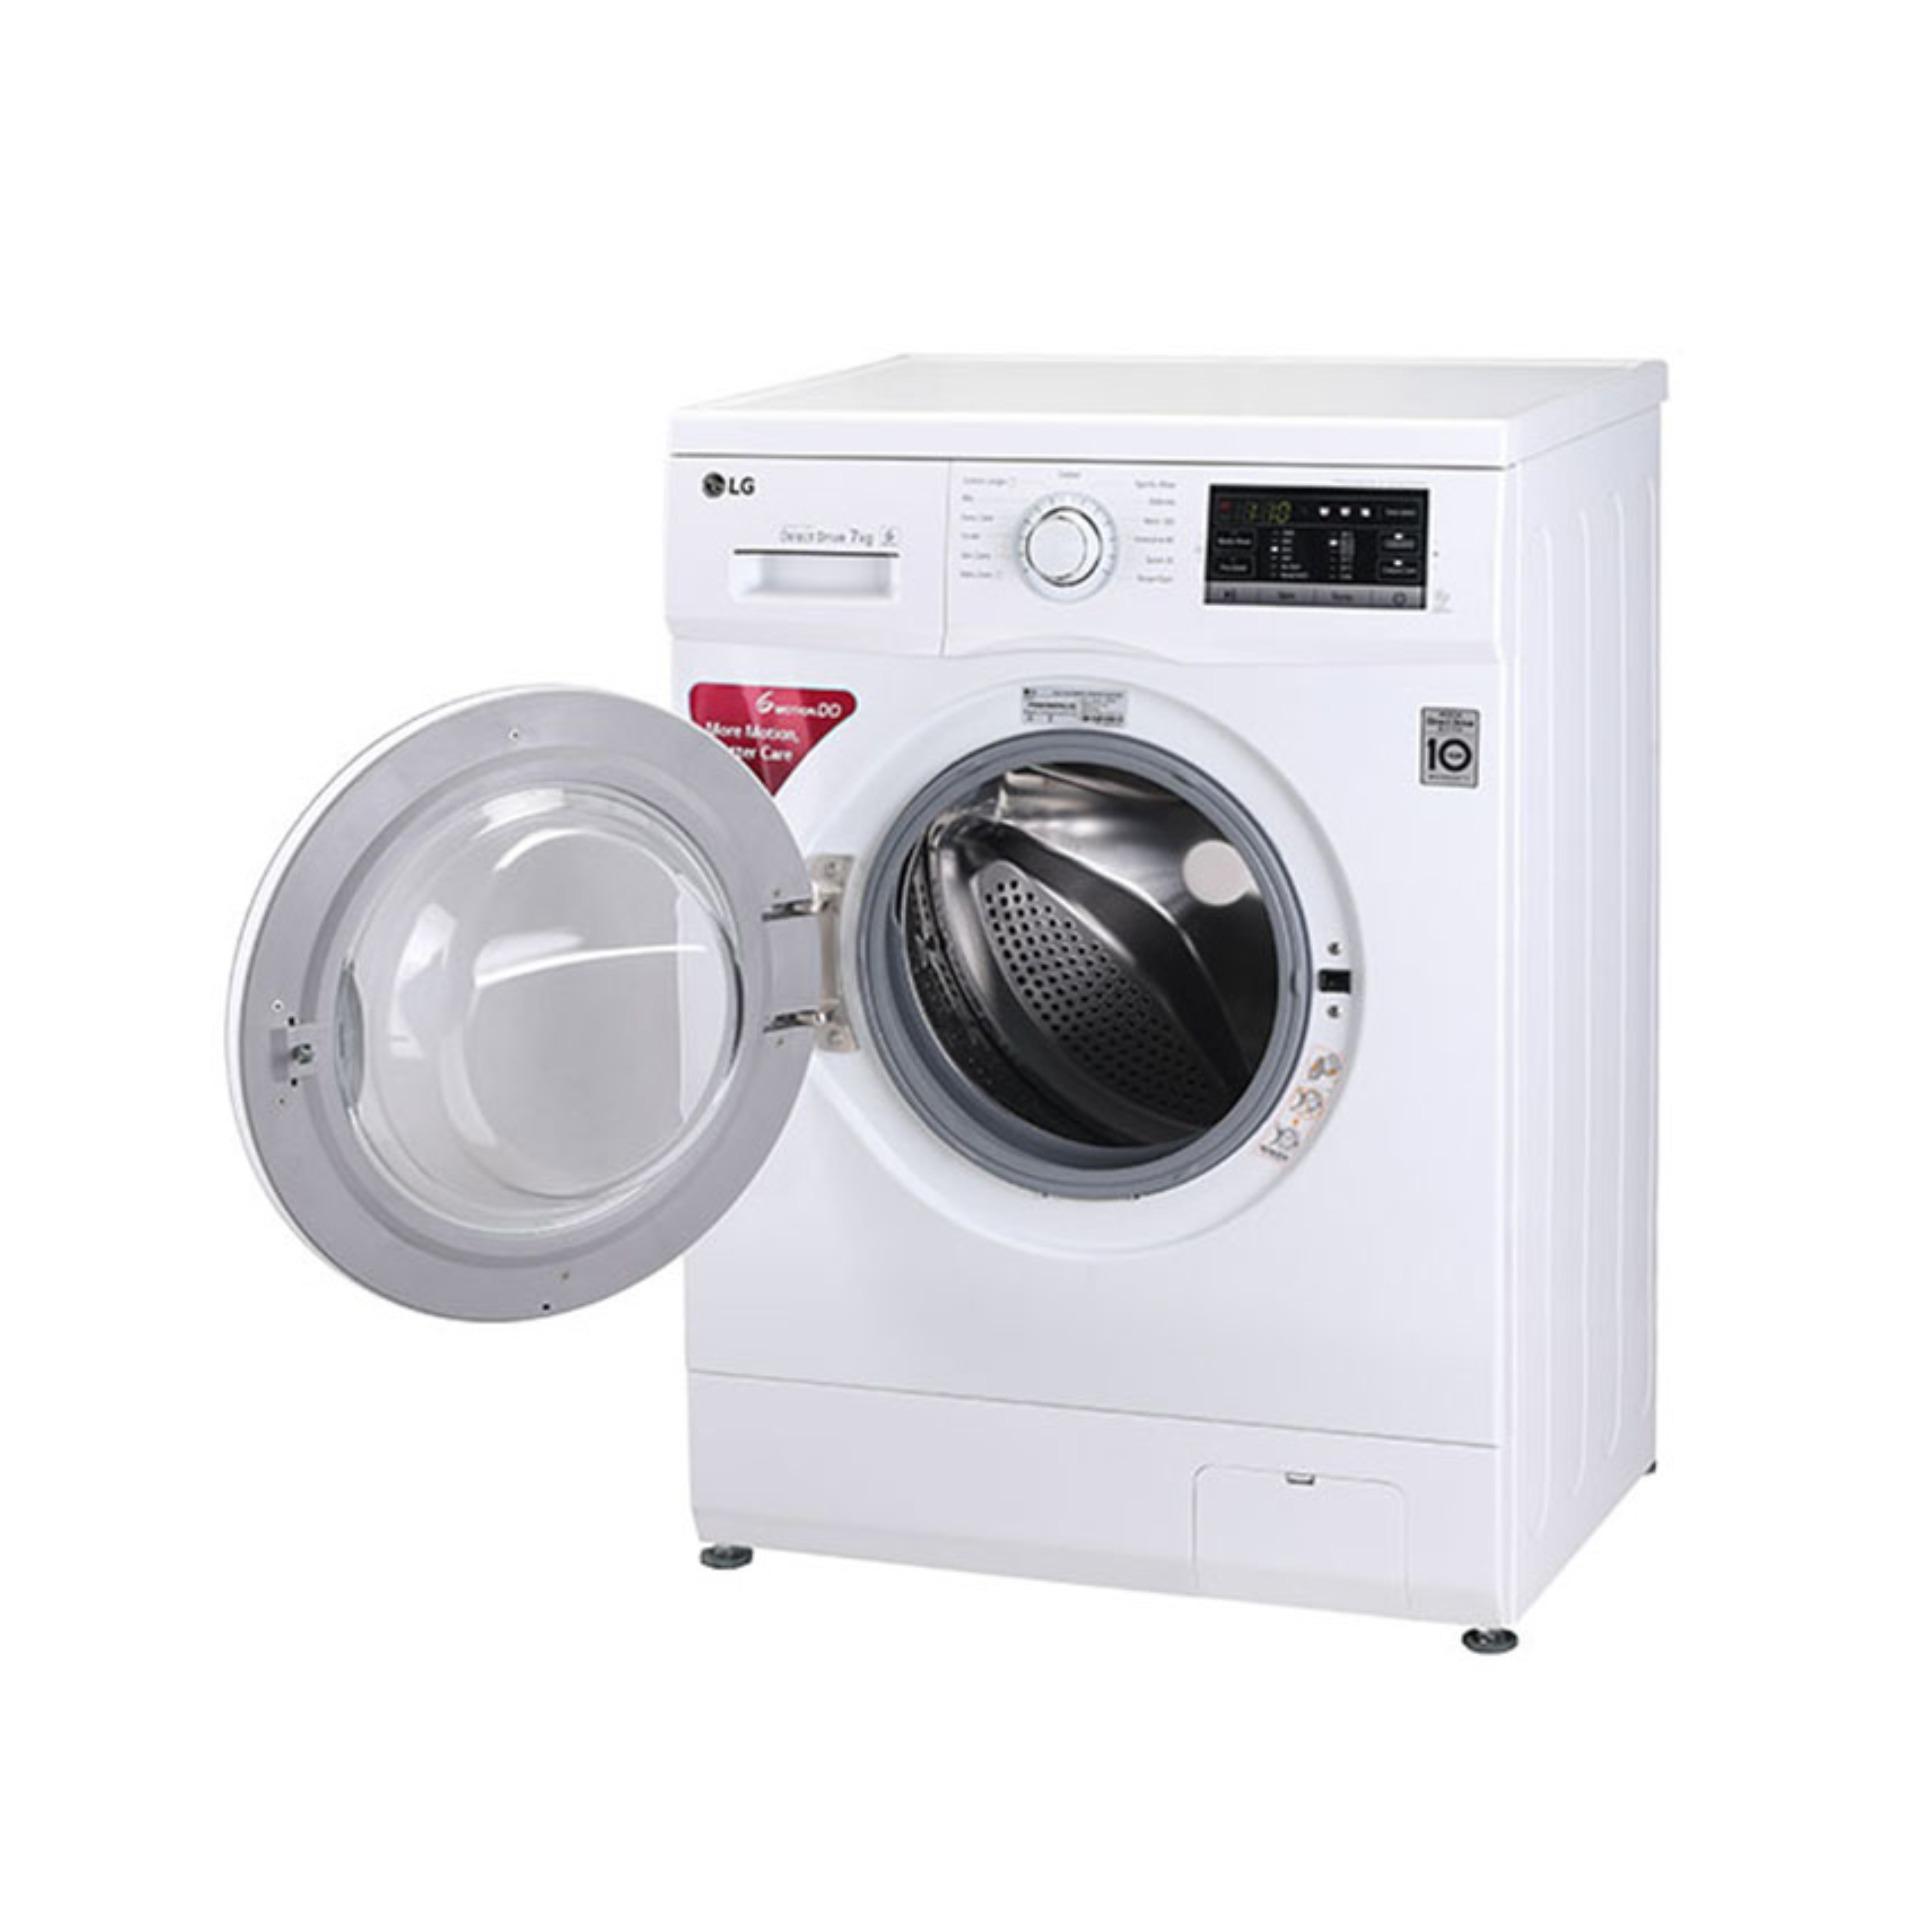 LG Washing Machine - 7Kg - White - F1207NMTW